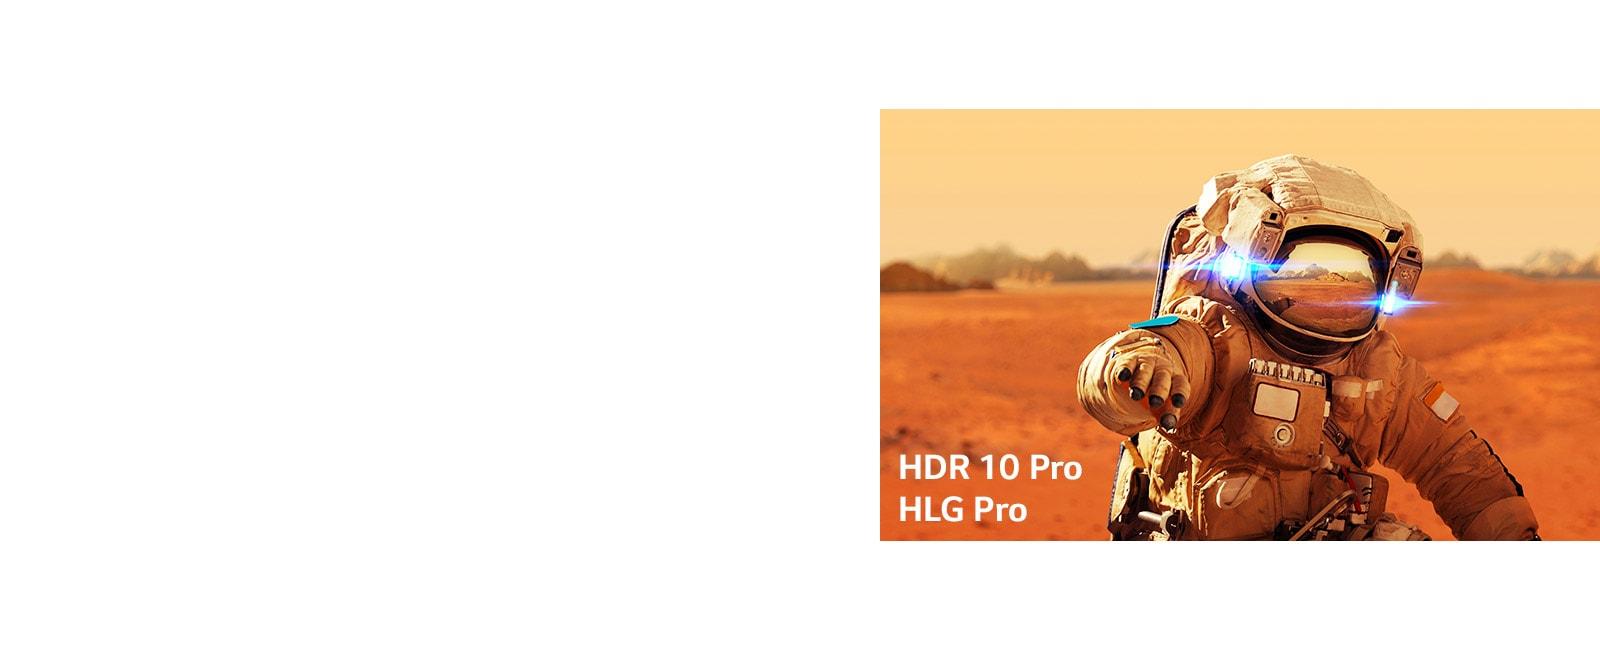 Marvel Iron Man, judul gambar dengan logo HLG Pro dan HDR 10 Pro